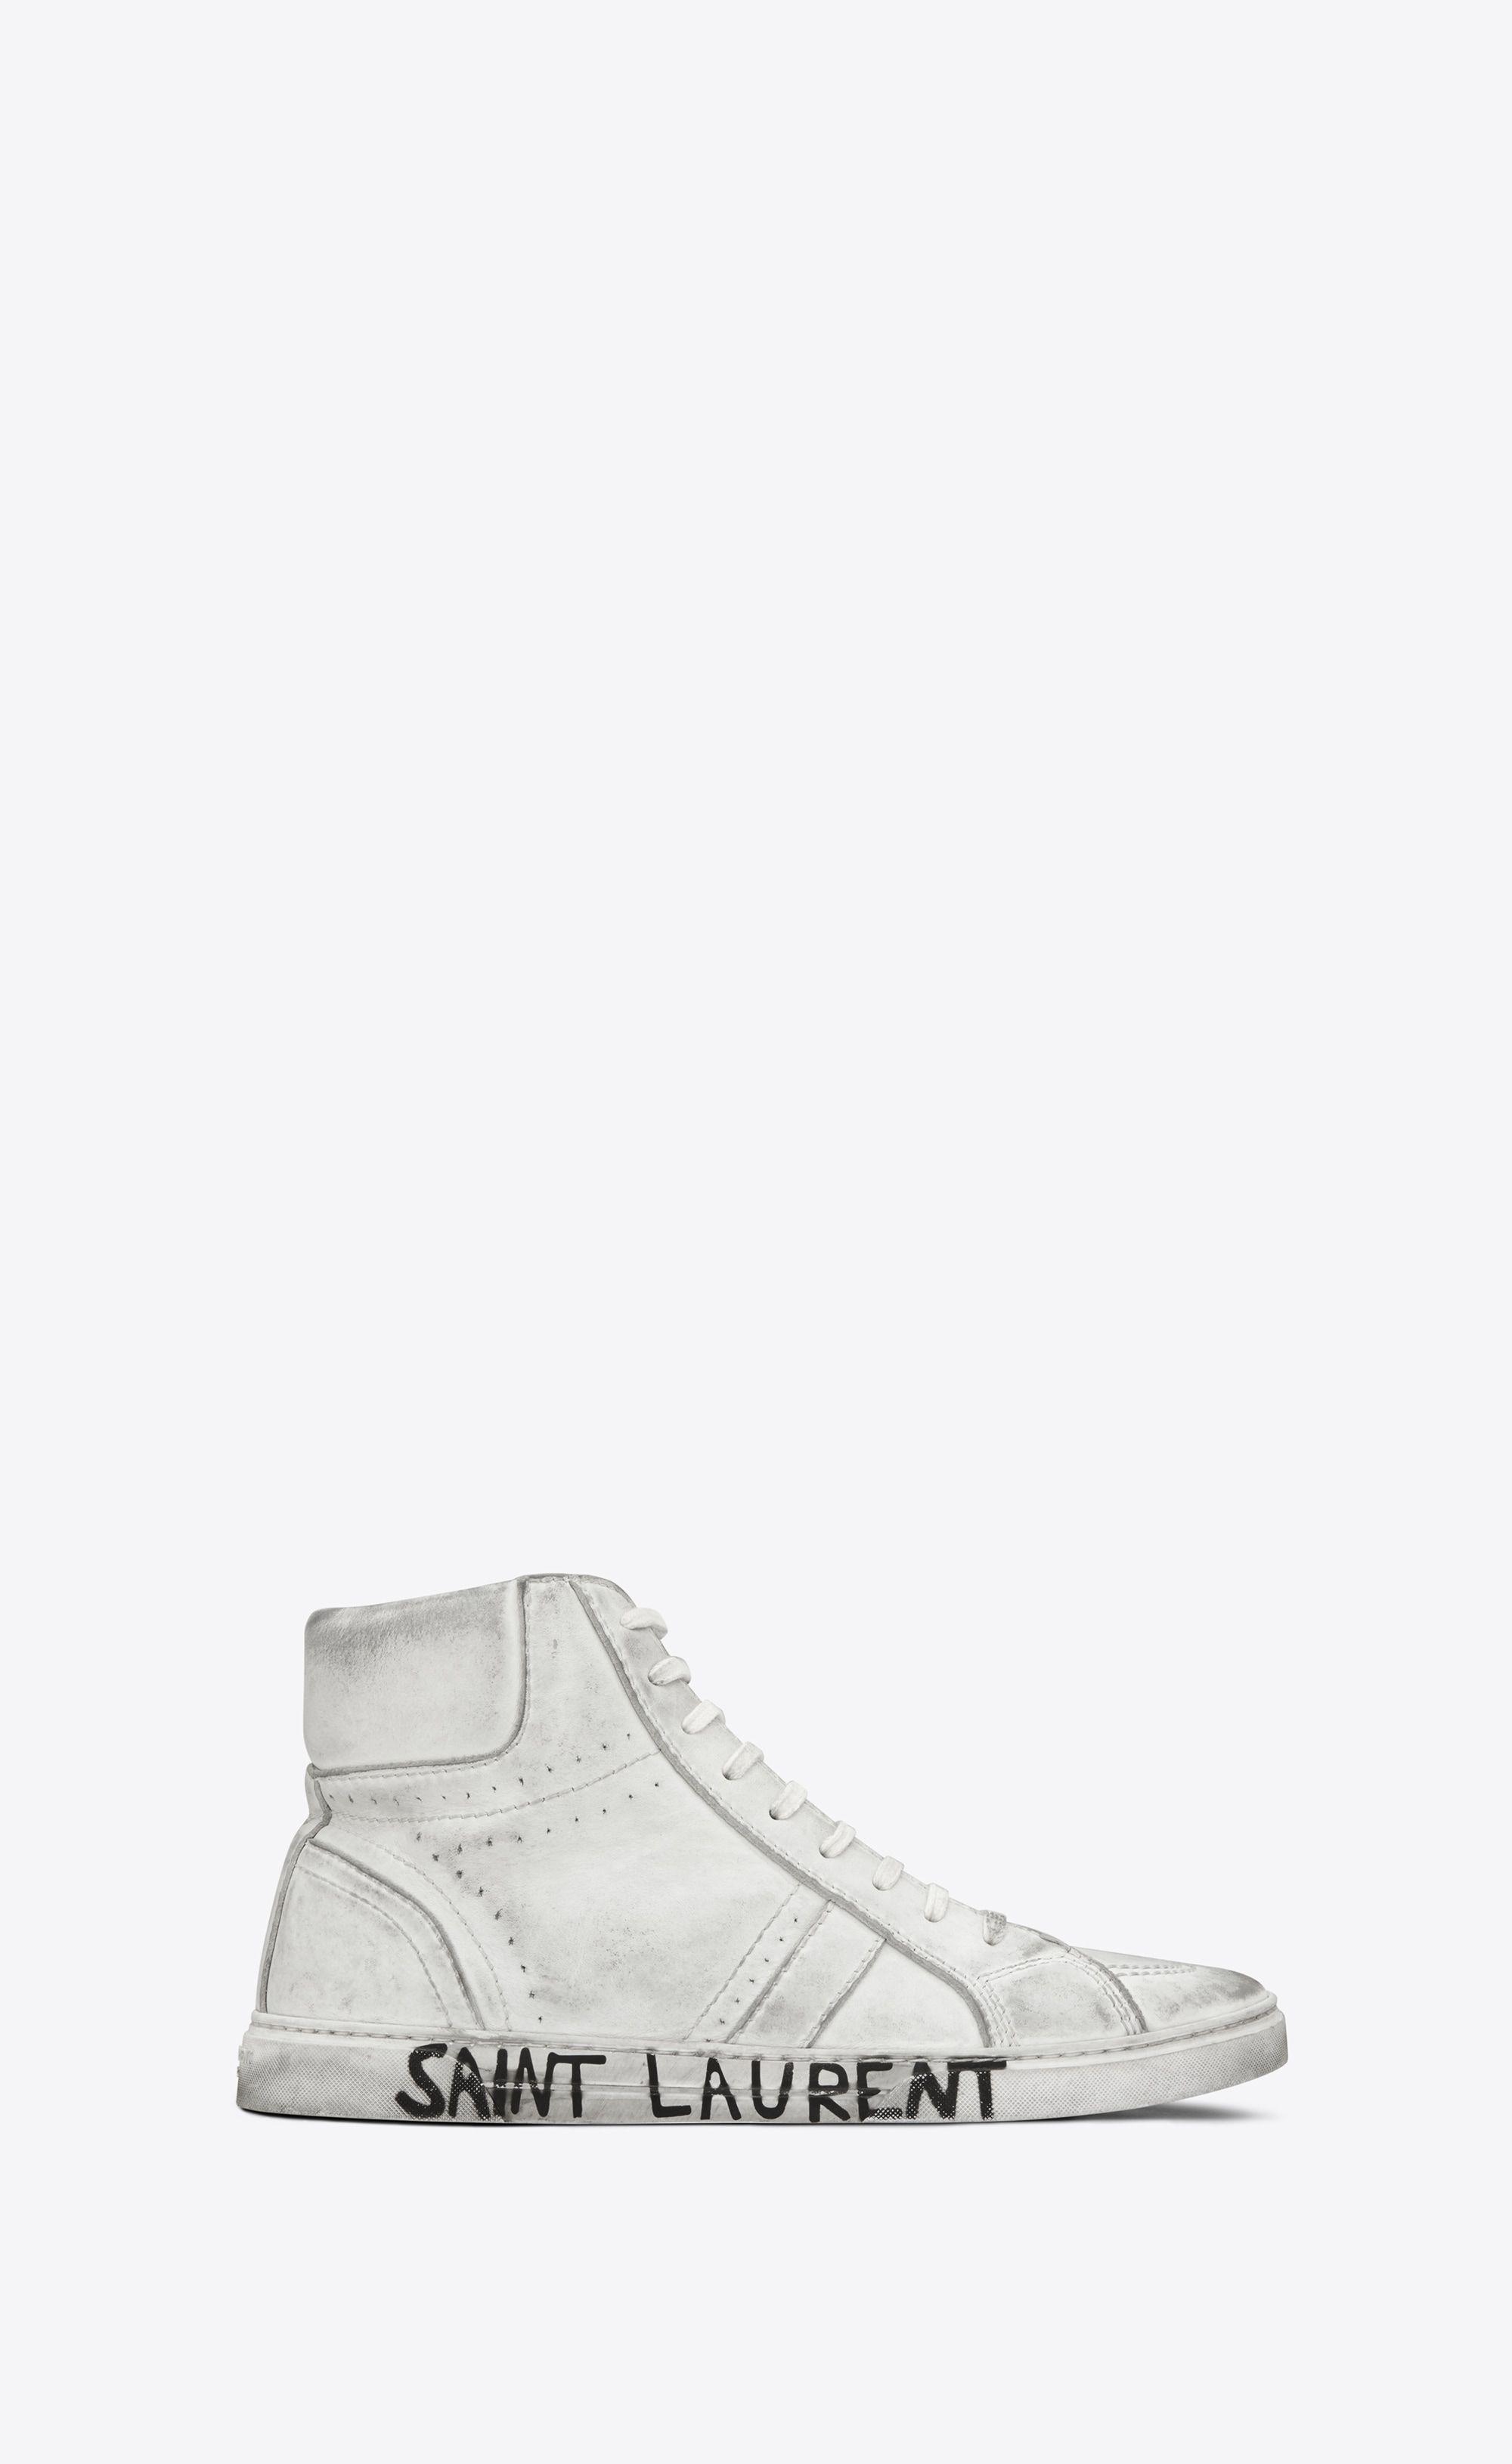 timeless design f63fe eb7a6 Saint Laurent Joe Sneaker In Worn Look White Leather   YSL.com